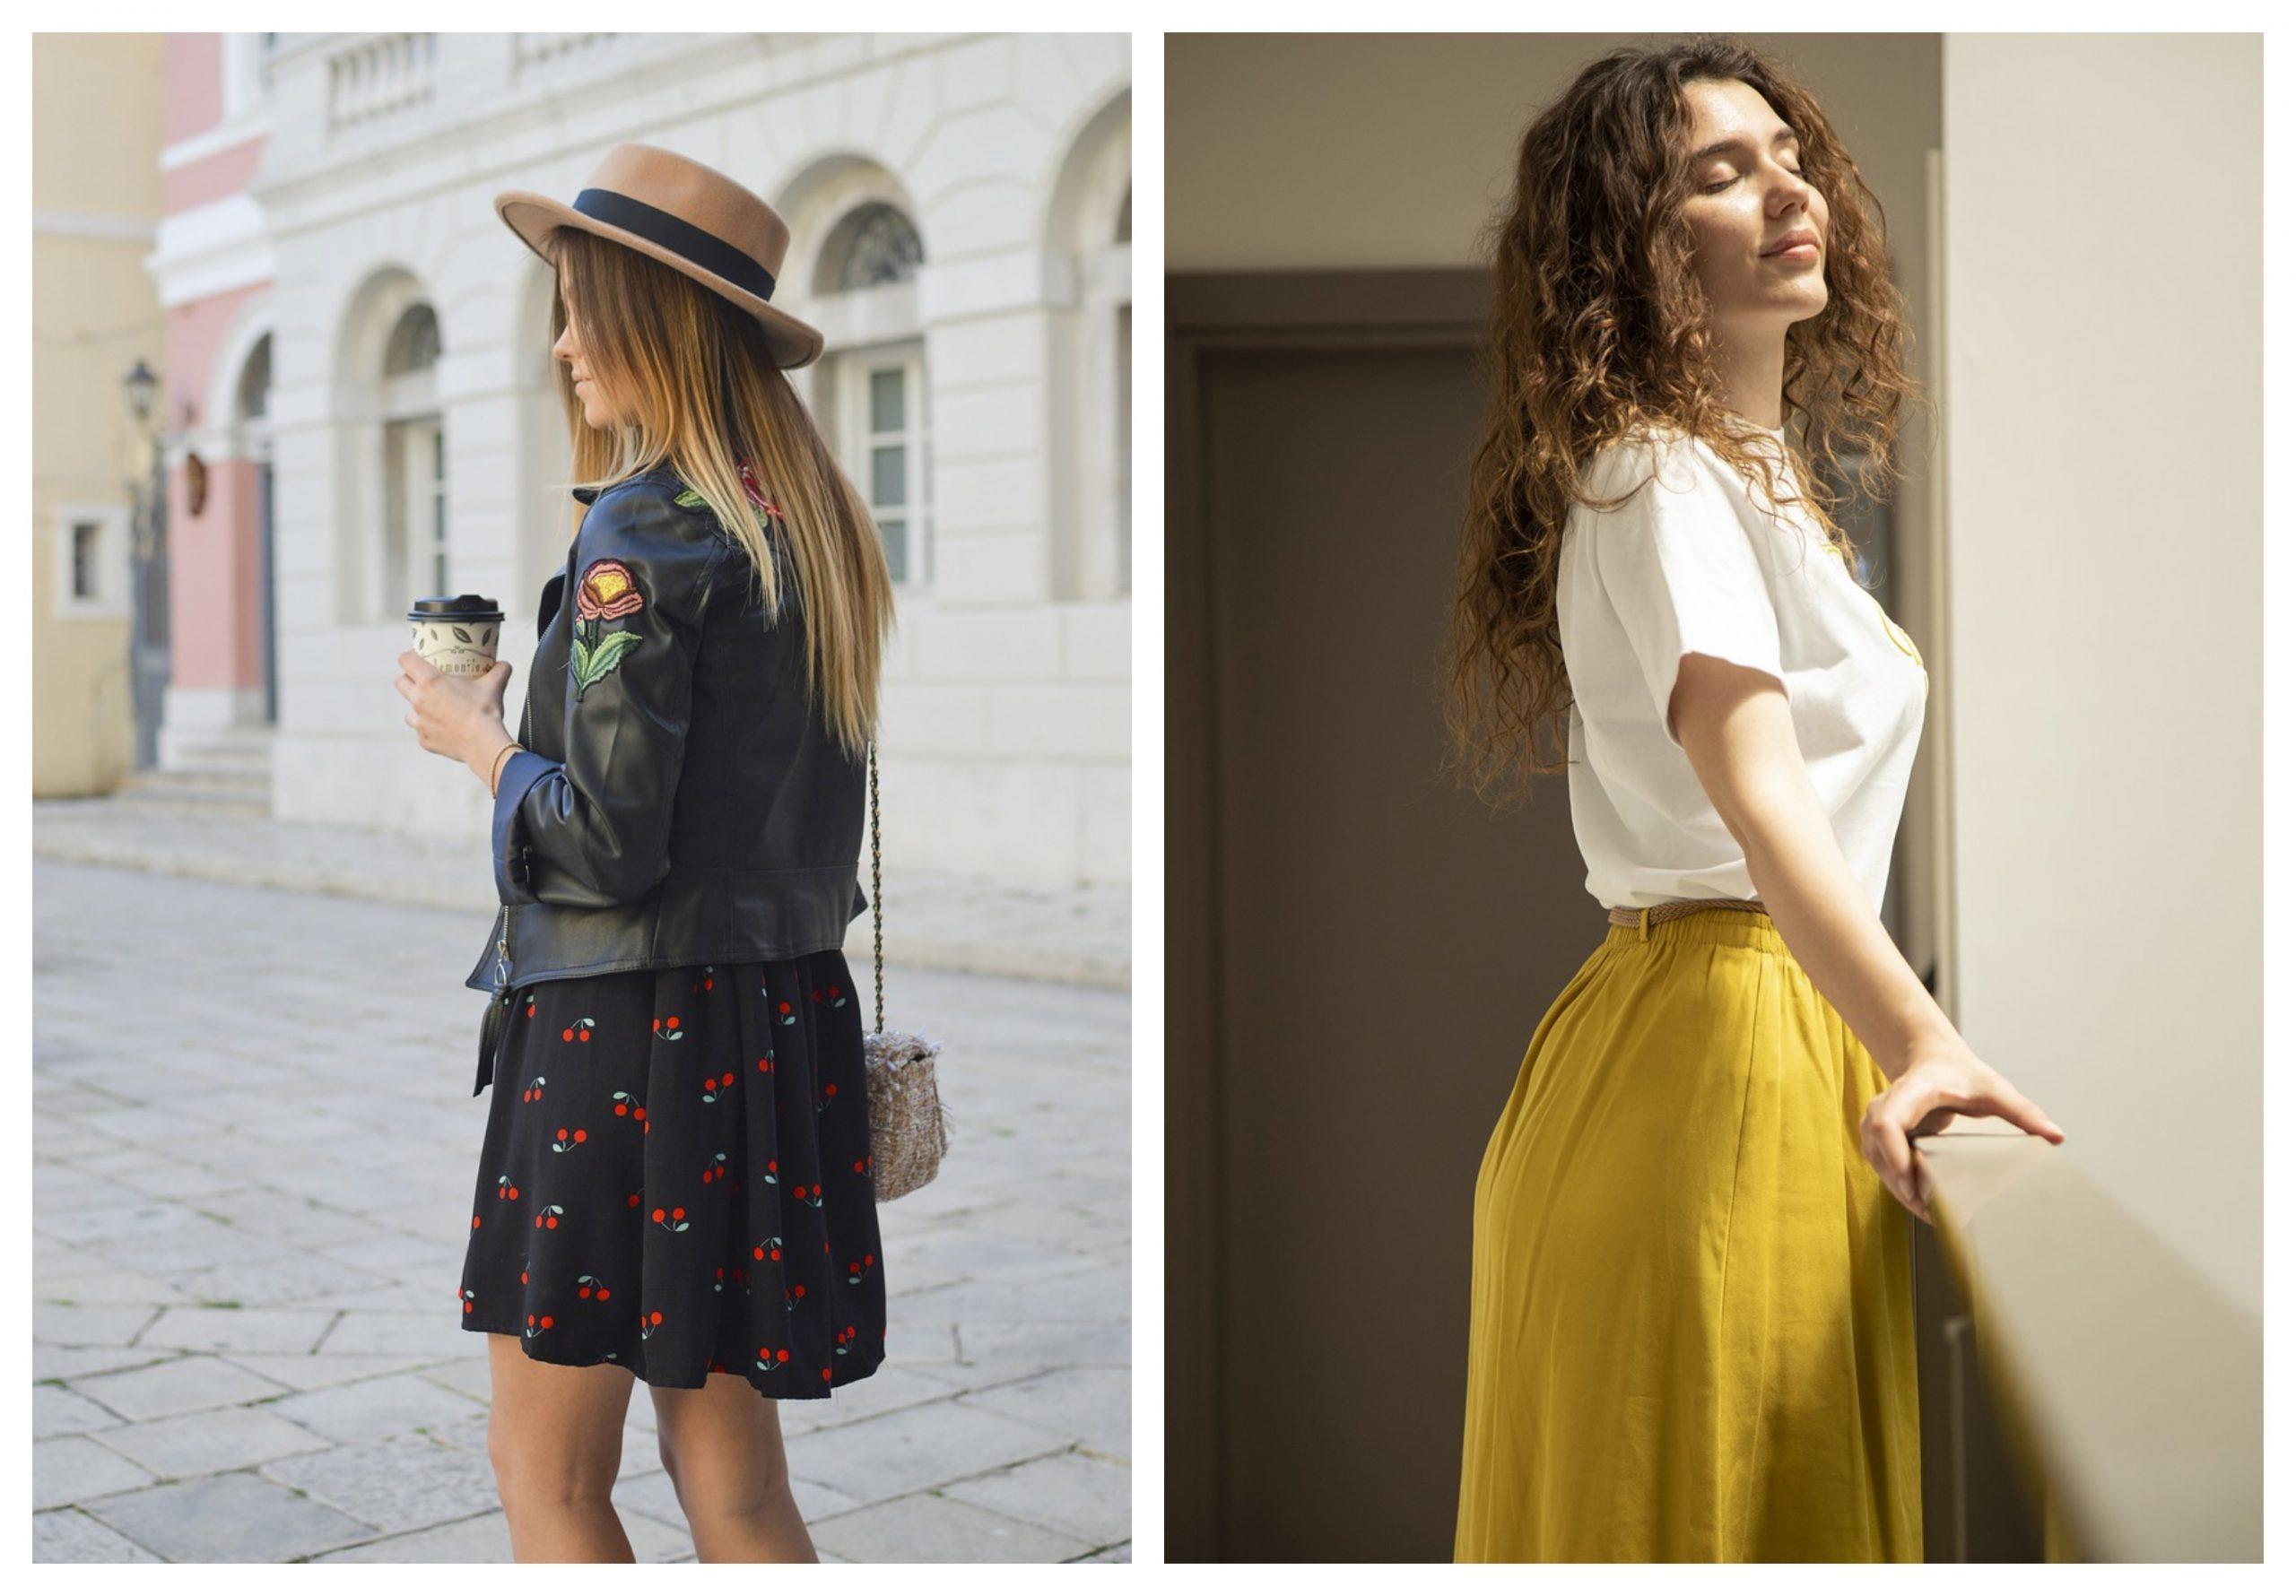 Cinco prendas que te harán ver más delgada